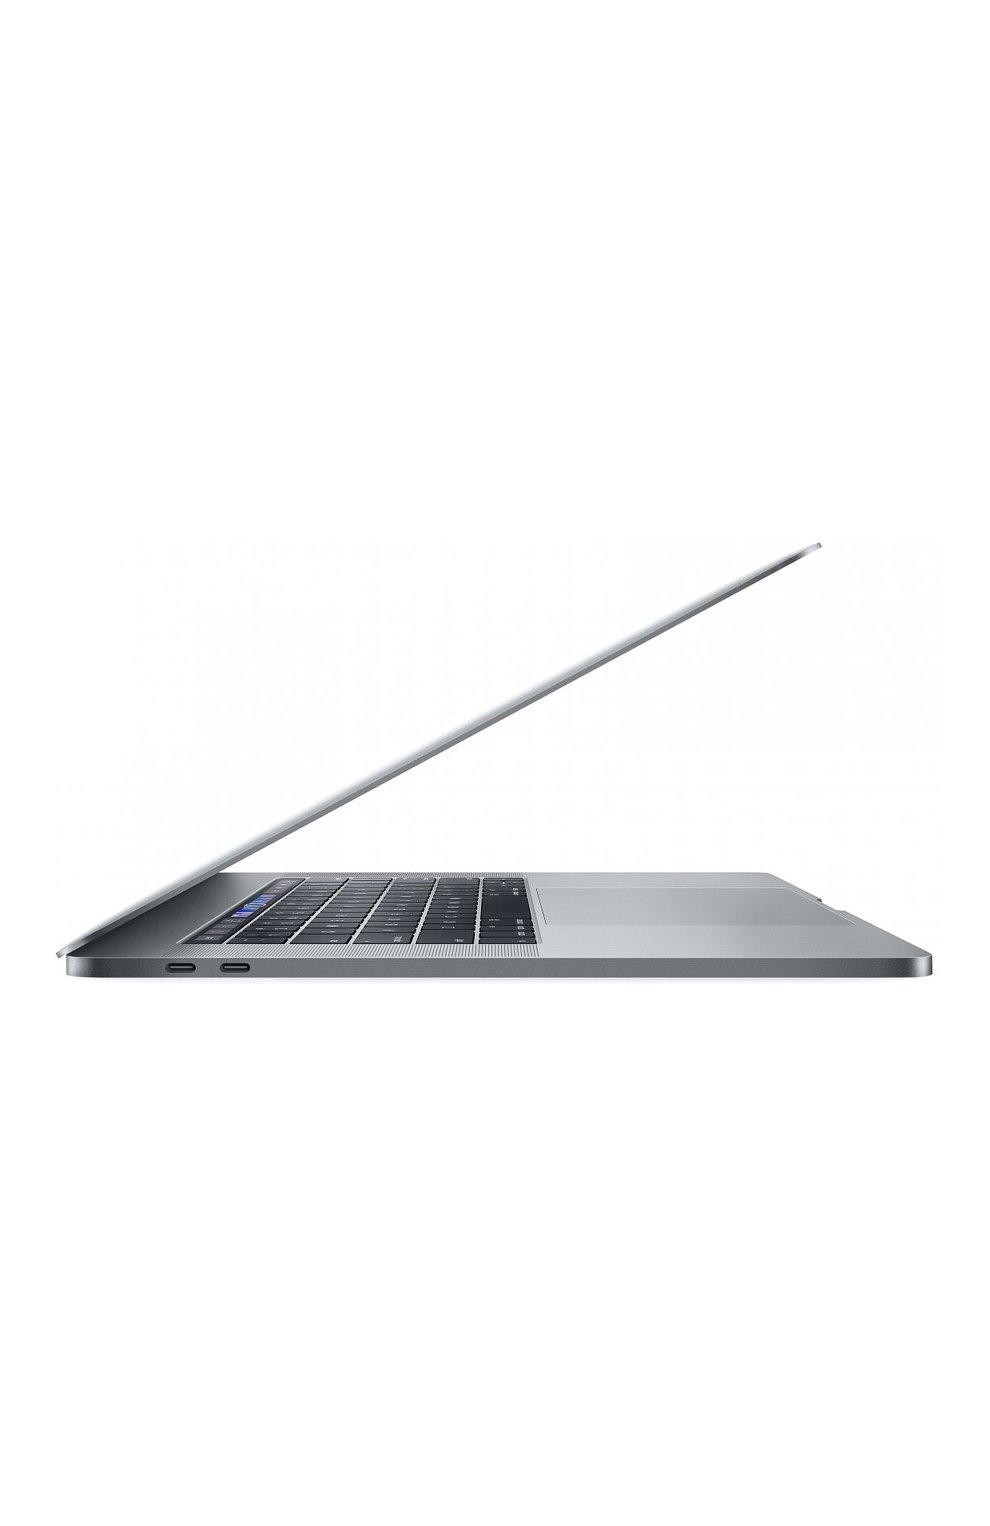 "MacBook Pro 15"" с панелью Touch Bar со встроенным датчиком Touch ID 6-Core i7 2.2GHz 256GB Space Gray Apple  | Фото №2"